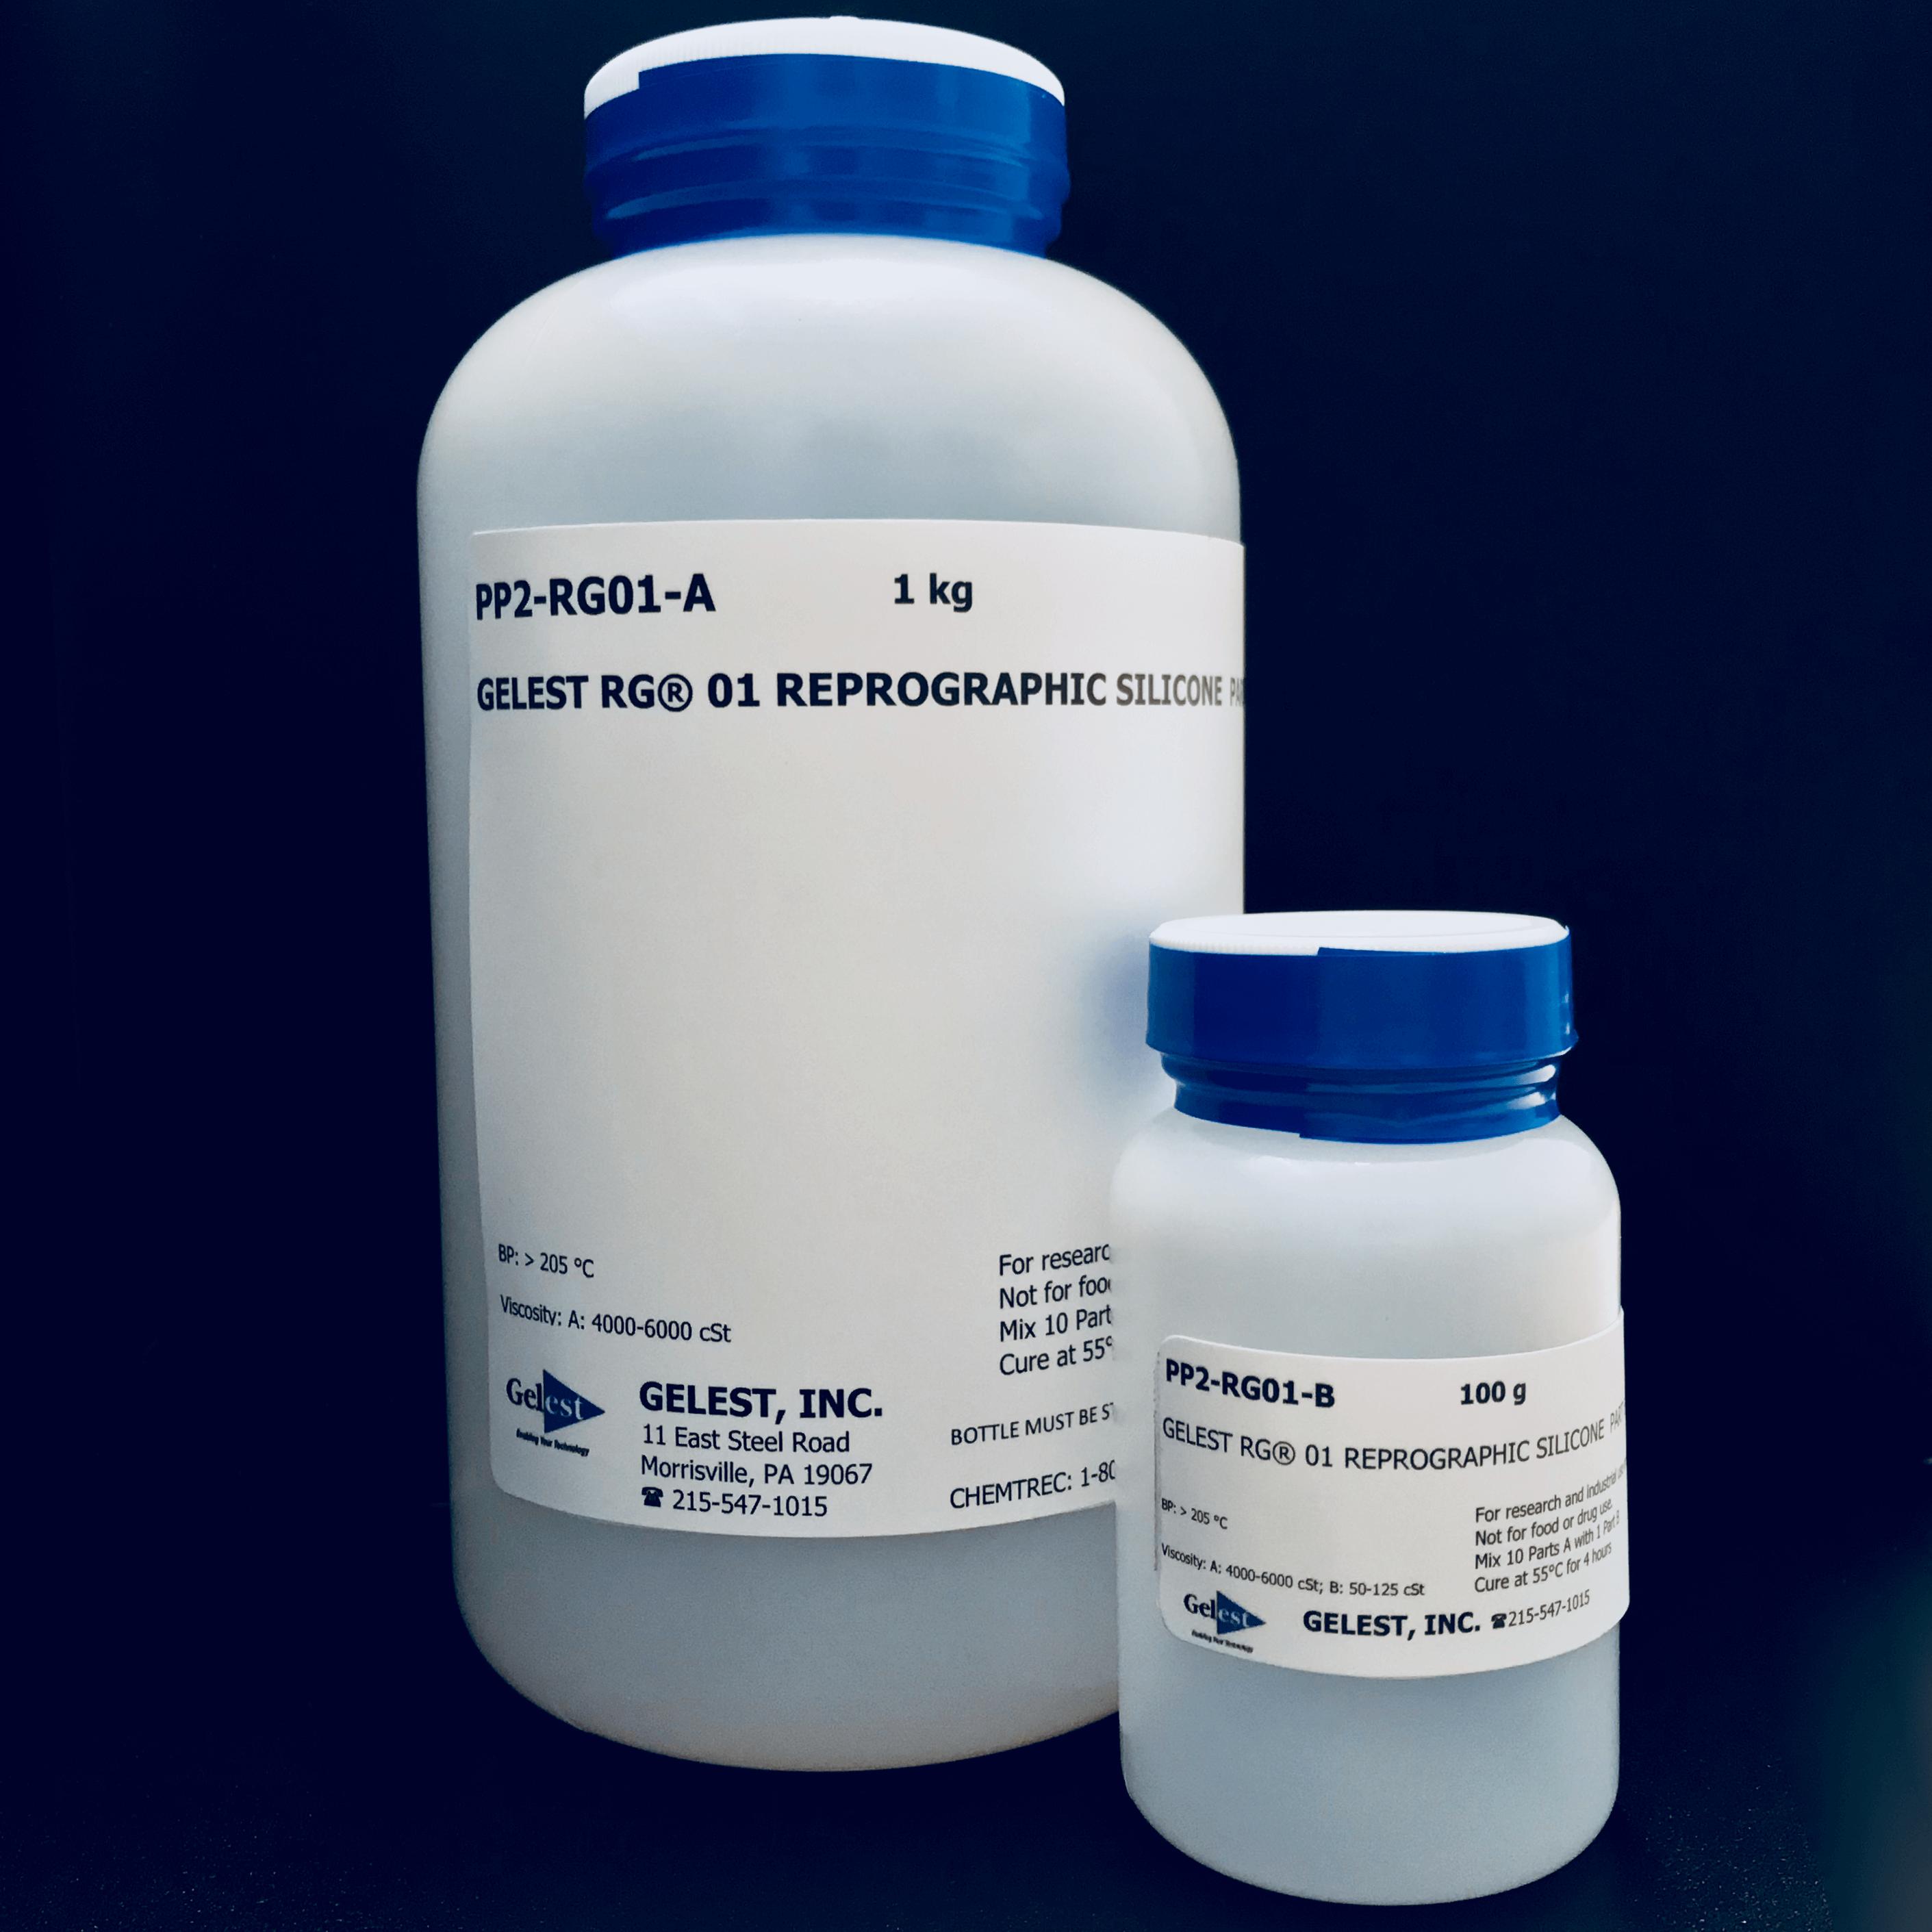 GELEST® RG 01: REPROGRAPHIC SILICONE